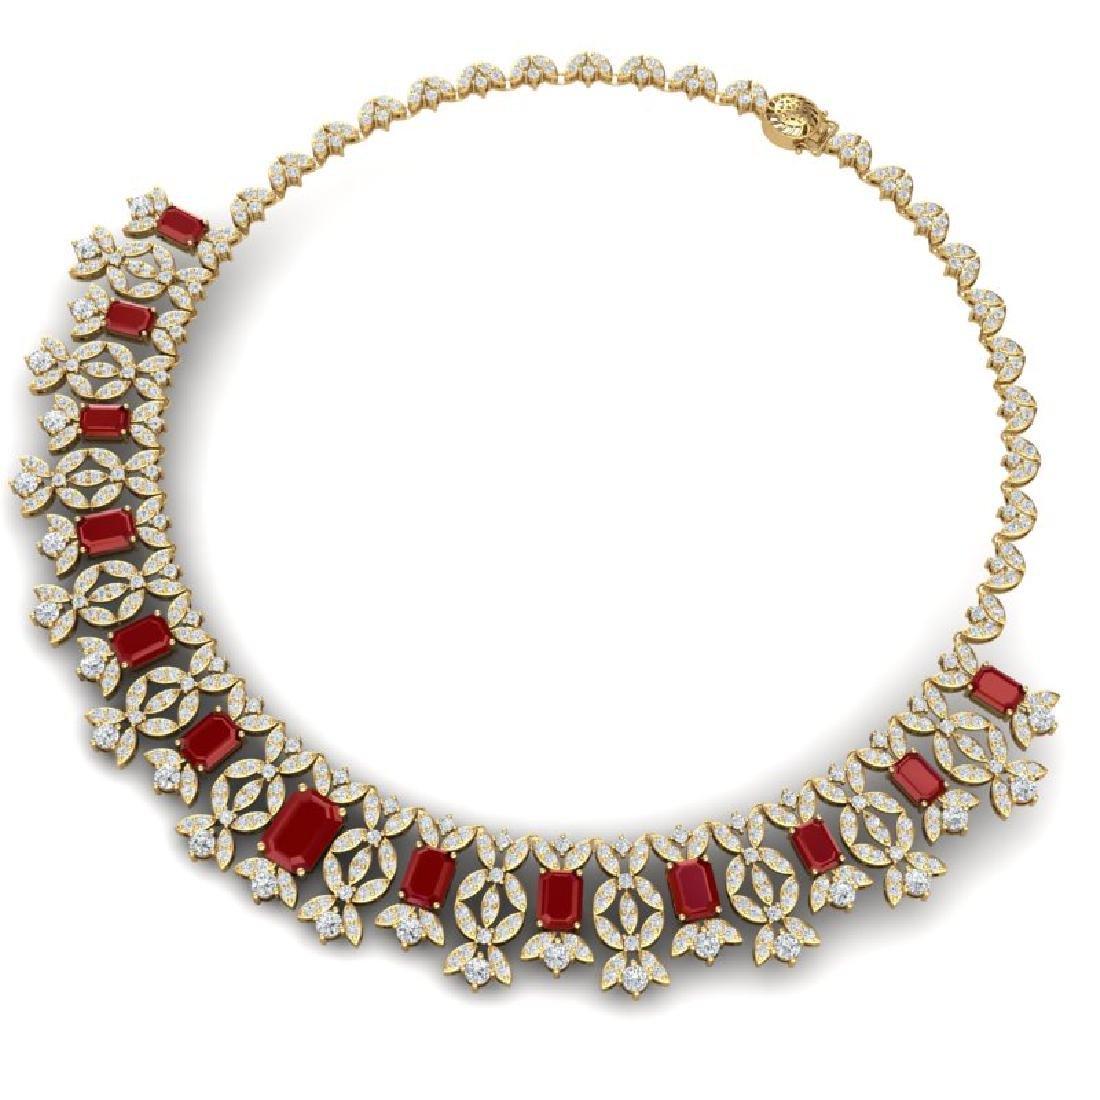 50.44 CTW Royalty Ruby & VS Diamond Necklace 18K Yellow - 2